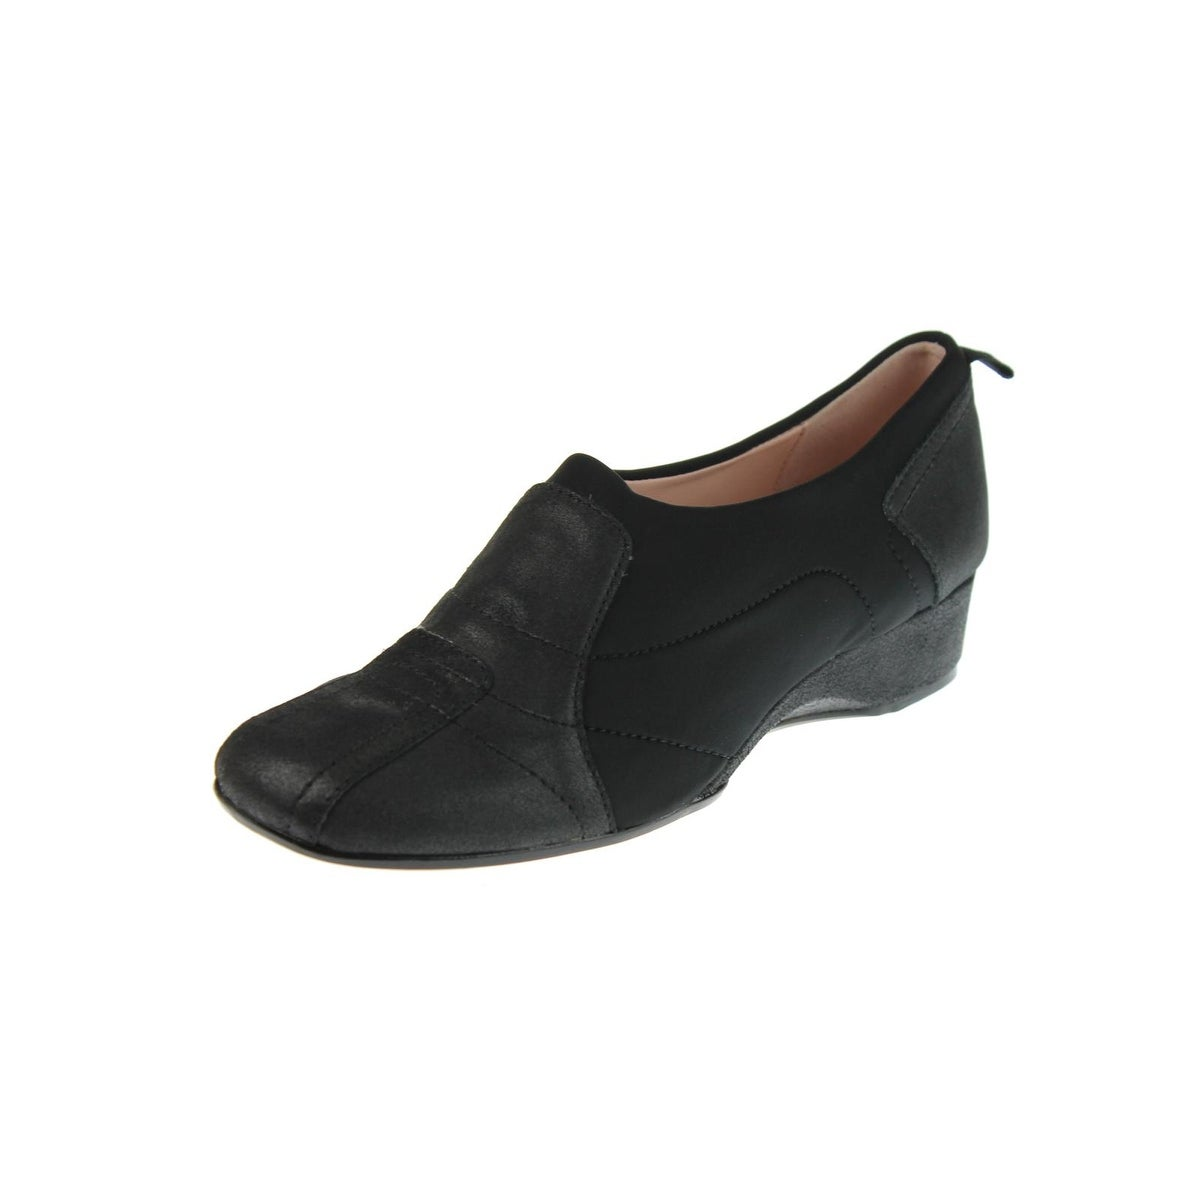 Taryn Rose Womens Kuss Round Toe Heels Textured Slip On - Free Shipping  Today - Overstock.com - 19827406